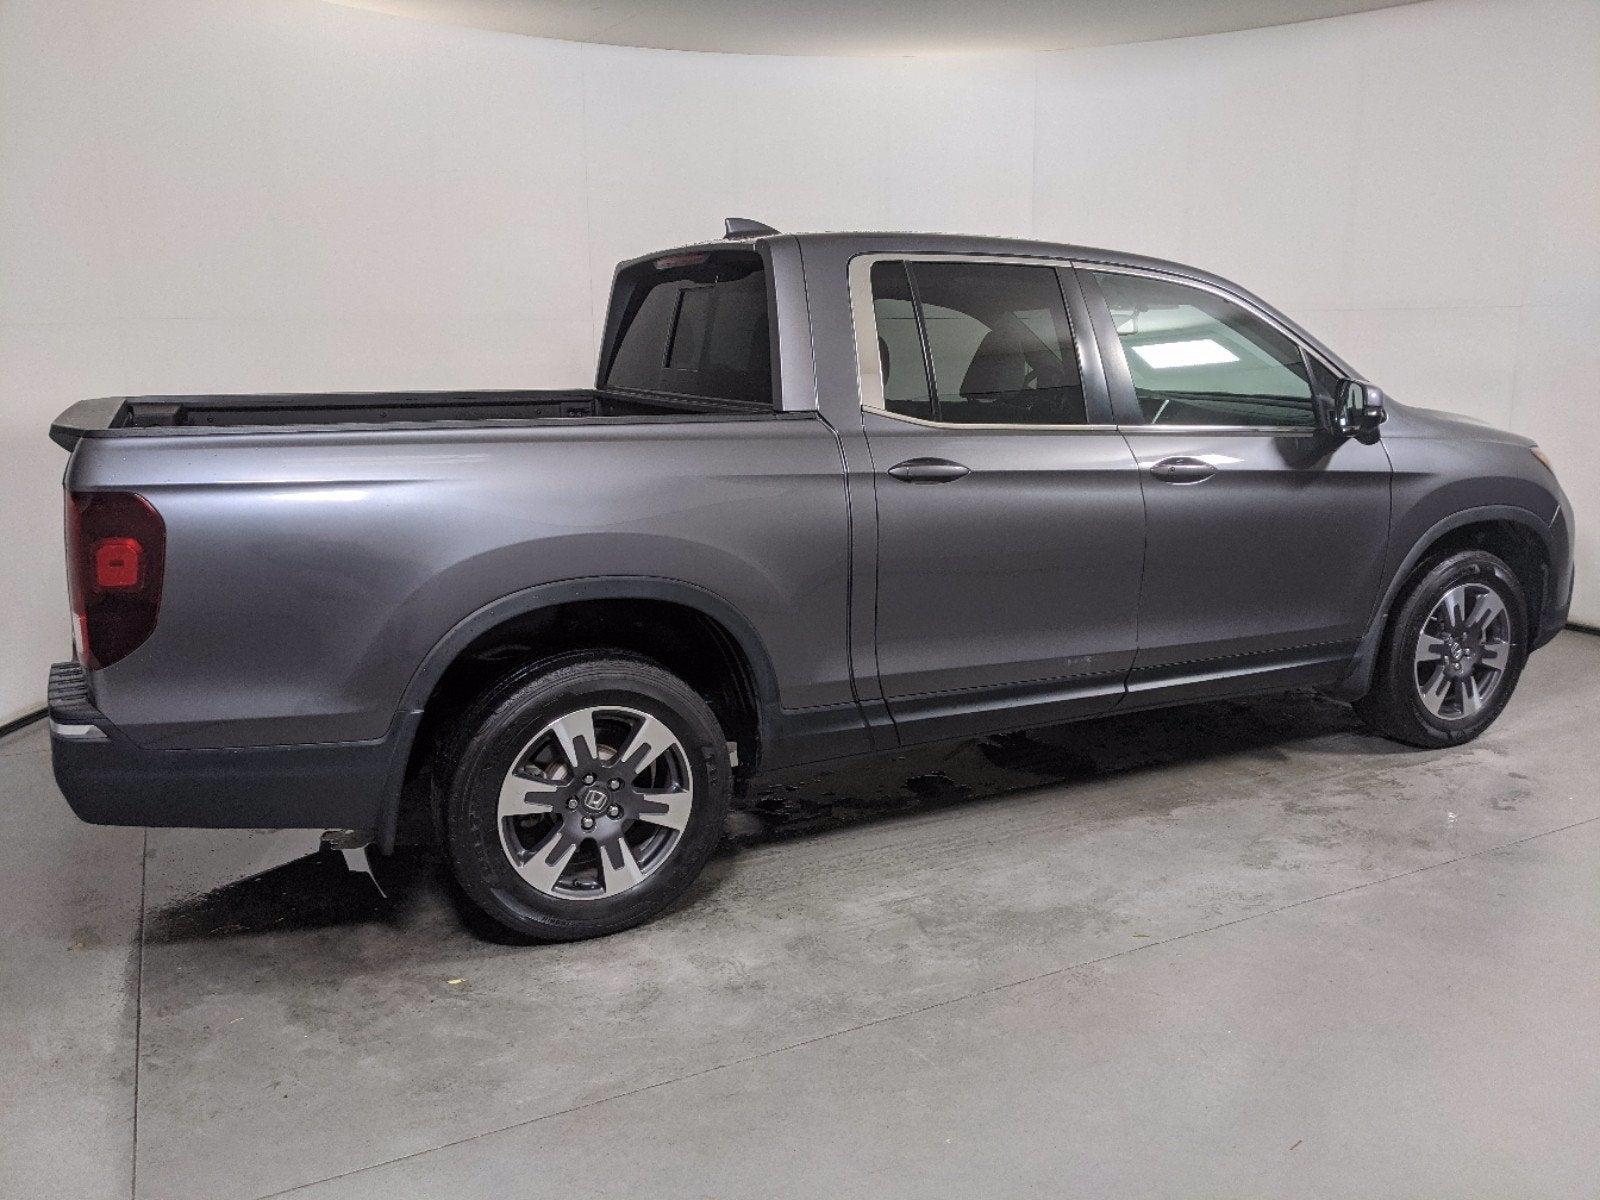 New 2019 Honda Ridgeline Rtl T Awd North Carolina 5fpyk3f67kb014676